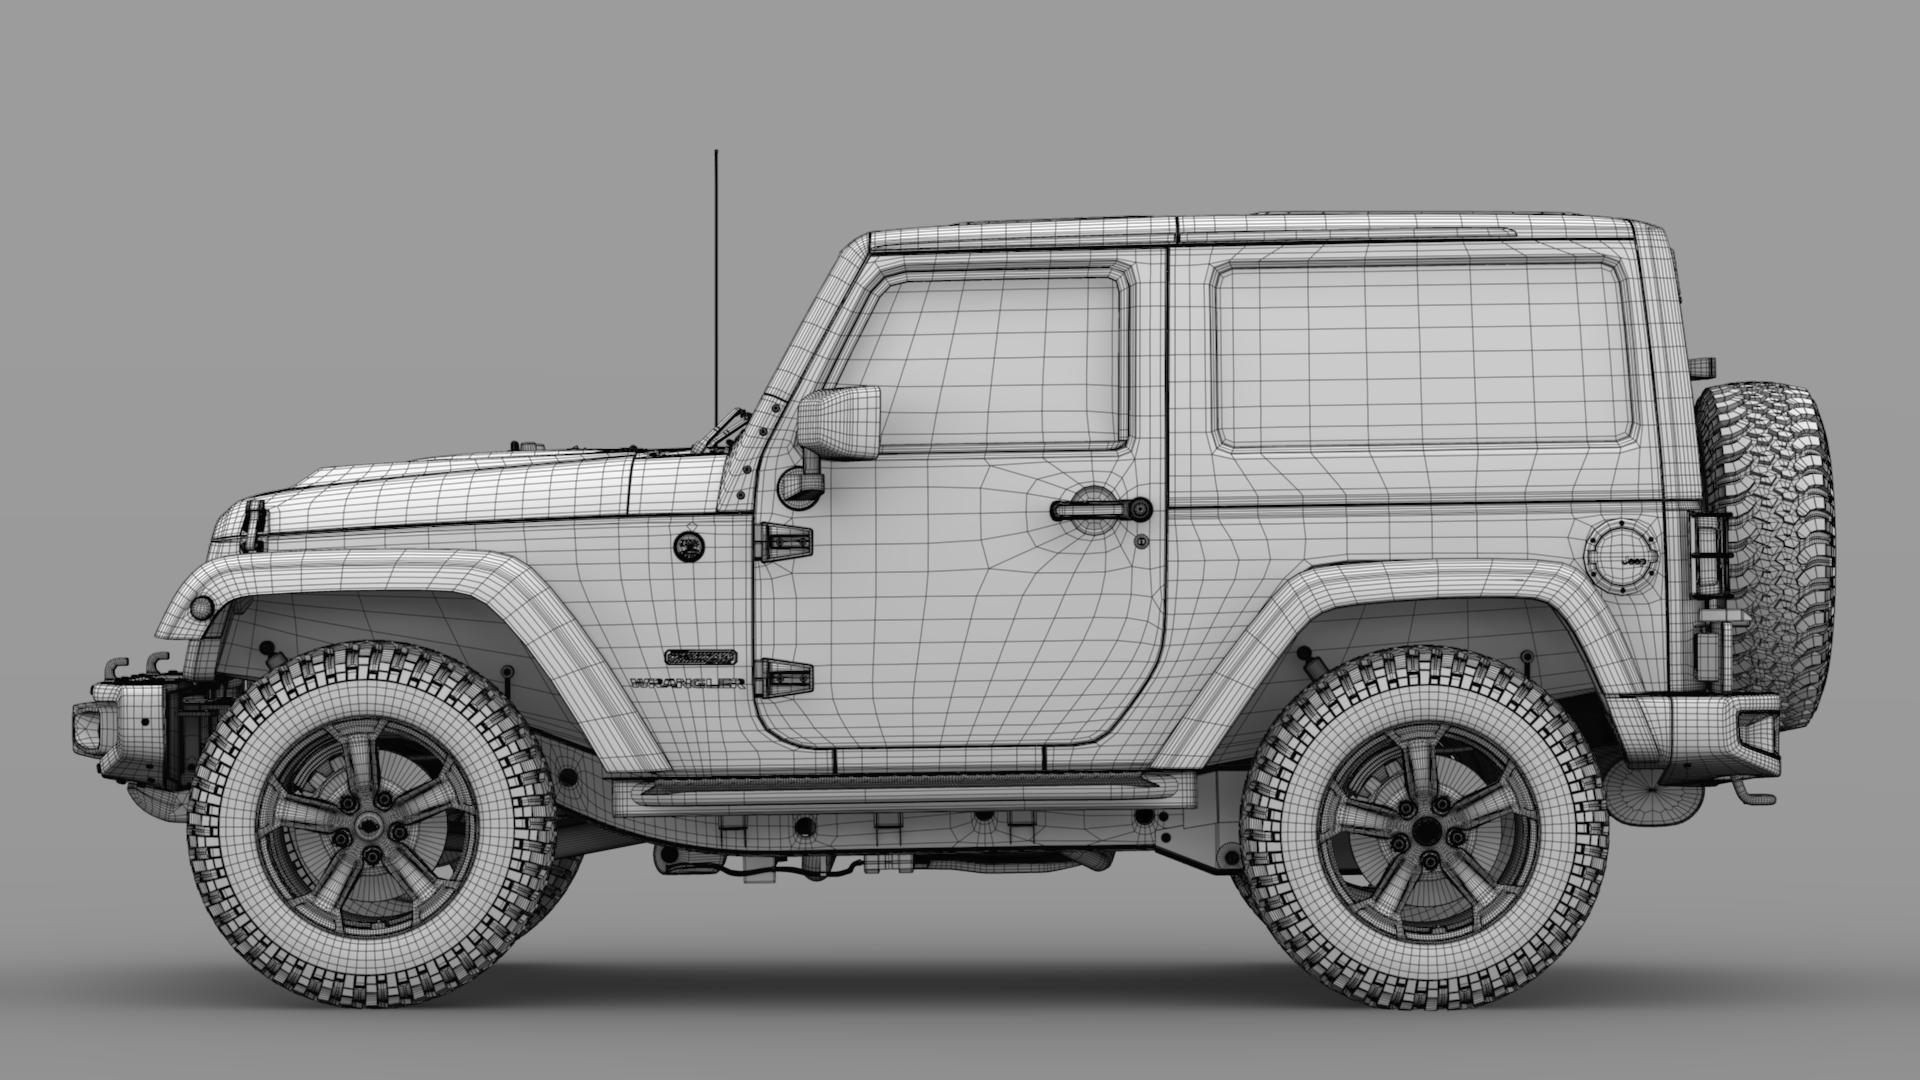 jeep wrangler rubicon recon jk 2017 3d model max fbx lwo ma mb hrc xsi obj 276955